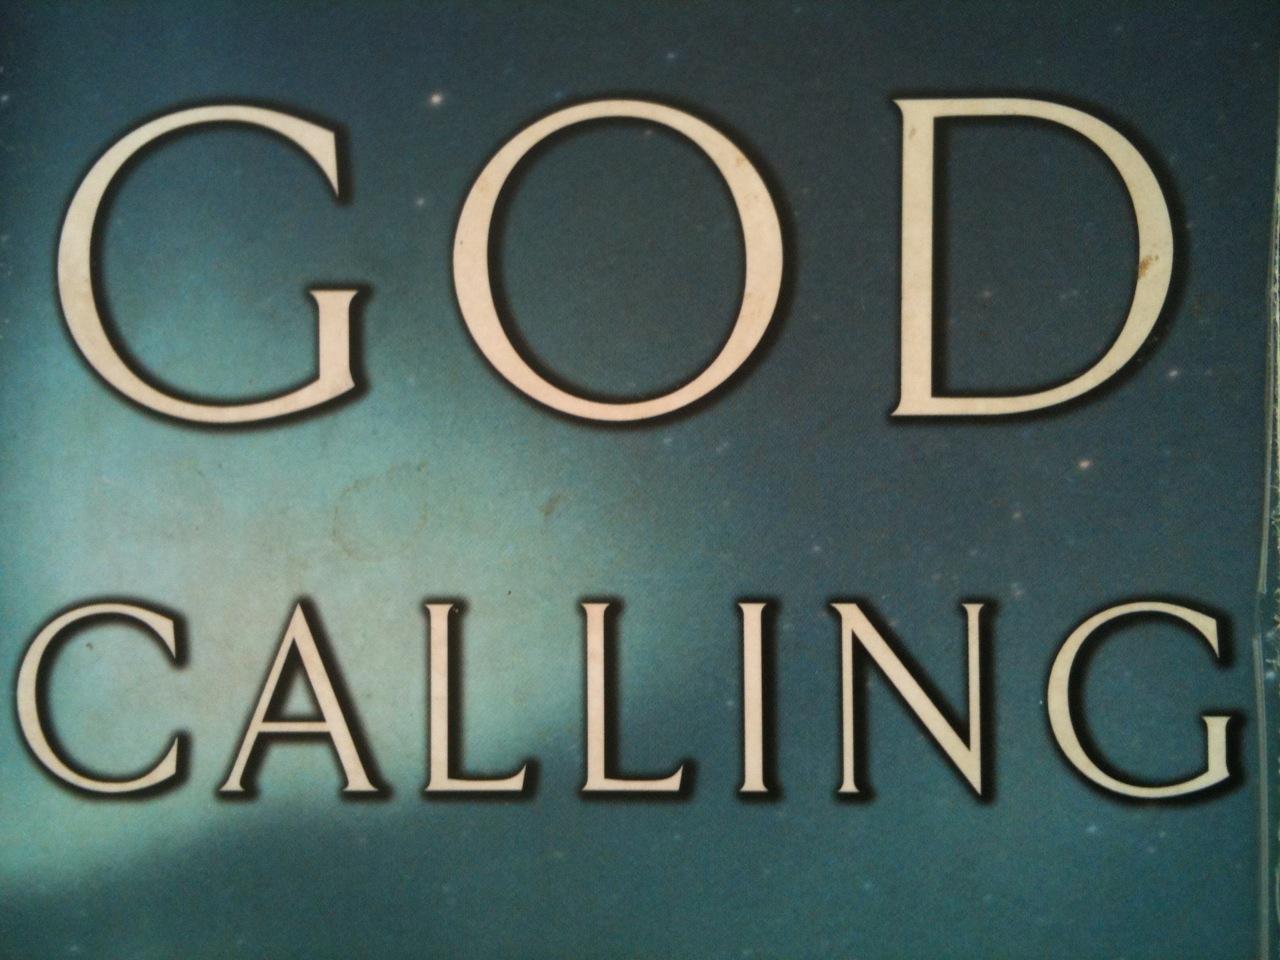 http://2.bp.blogspot.com/_L2rb-t87iMg/TLEzRuOMChI/AAAAAAAAAHU/bdxrH8vTnWA/s1600/god+calling.JPG